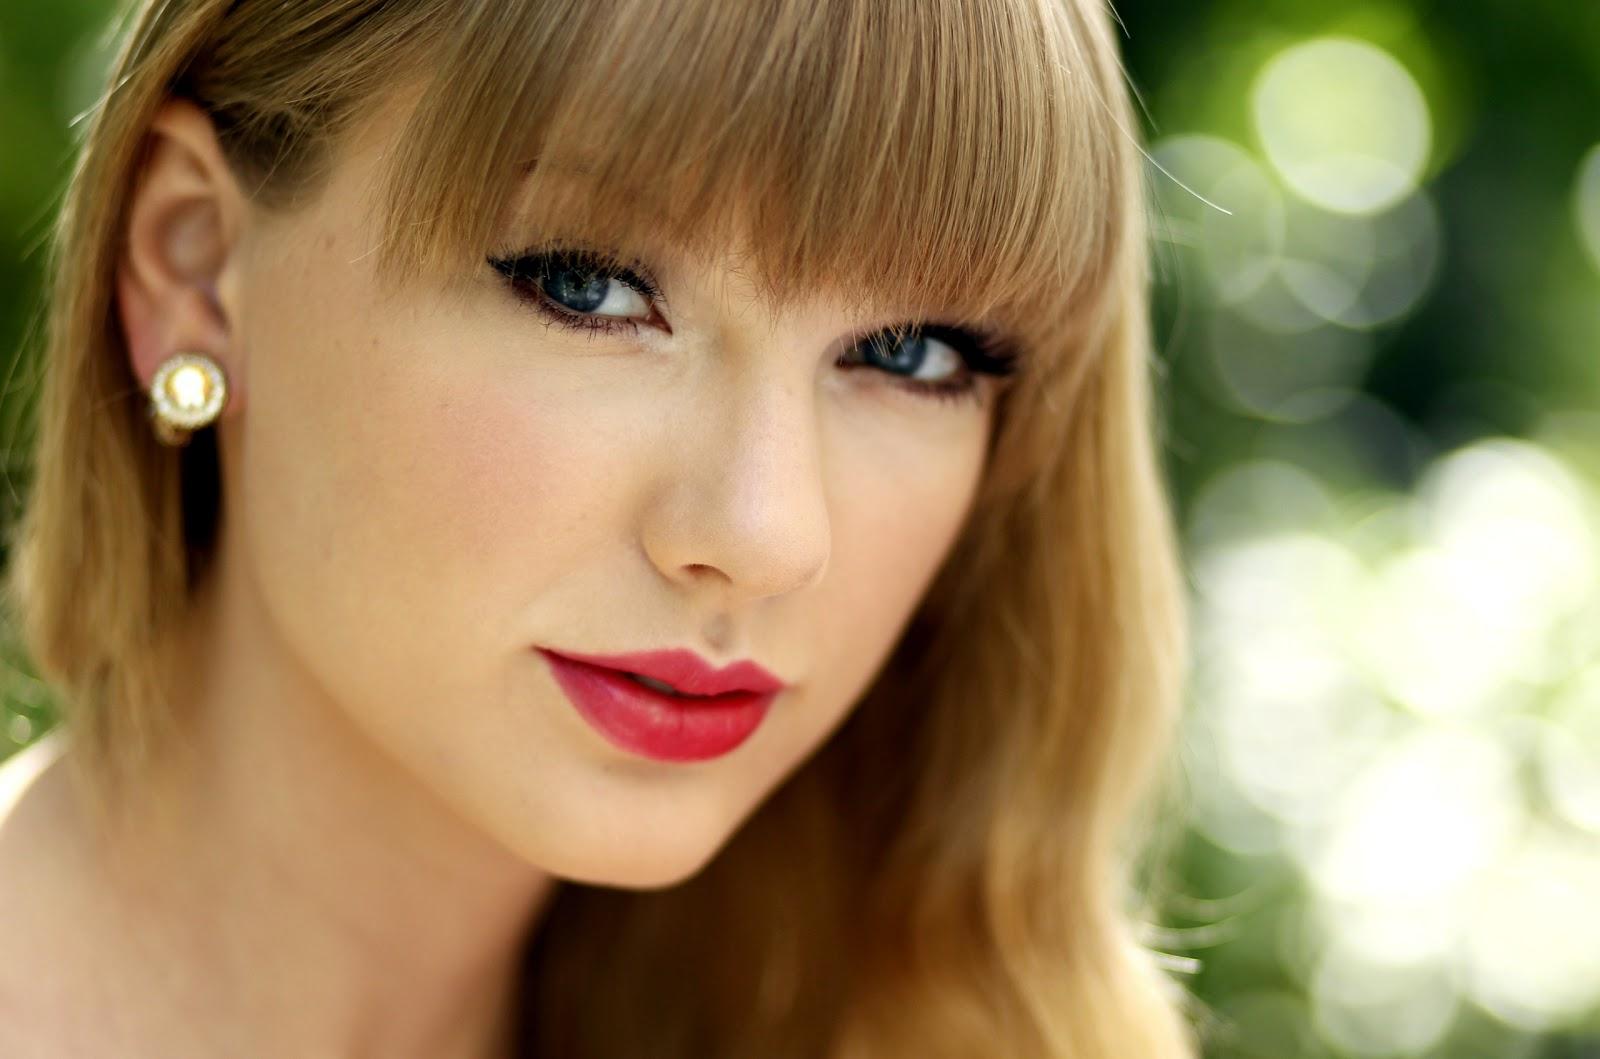 http://3.bp.blogspot.com/-8MyjmlyKDZY/UNllubVK0wI/AAAAAAAAA5E/i1b107kF60E/s1600/Taylor+Swift+State+of+Grace.jpg